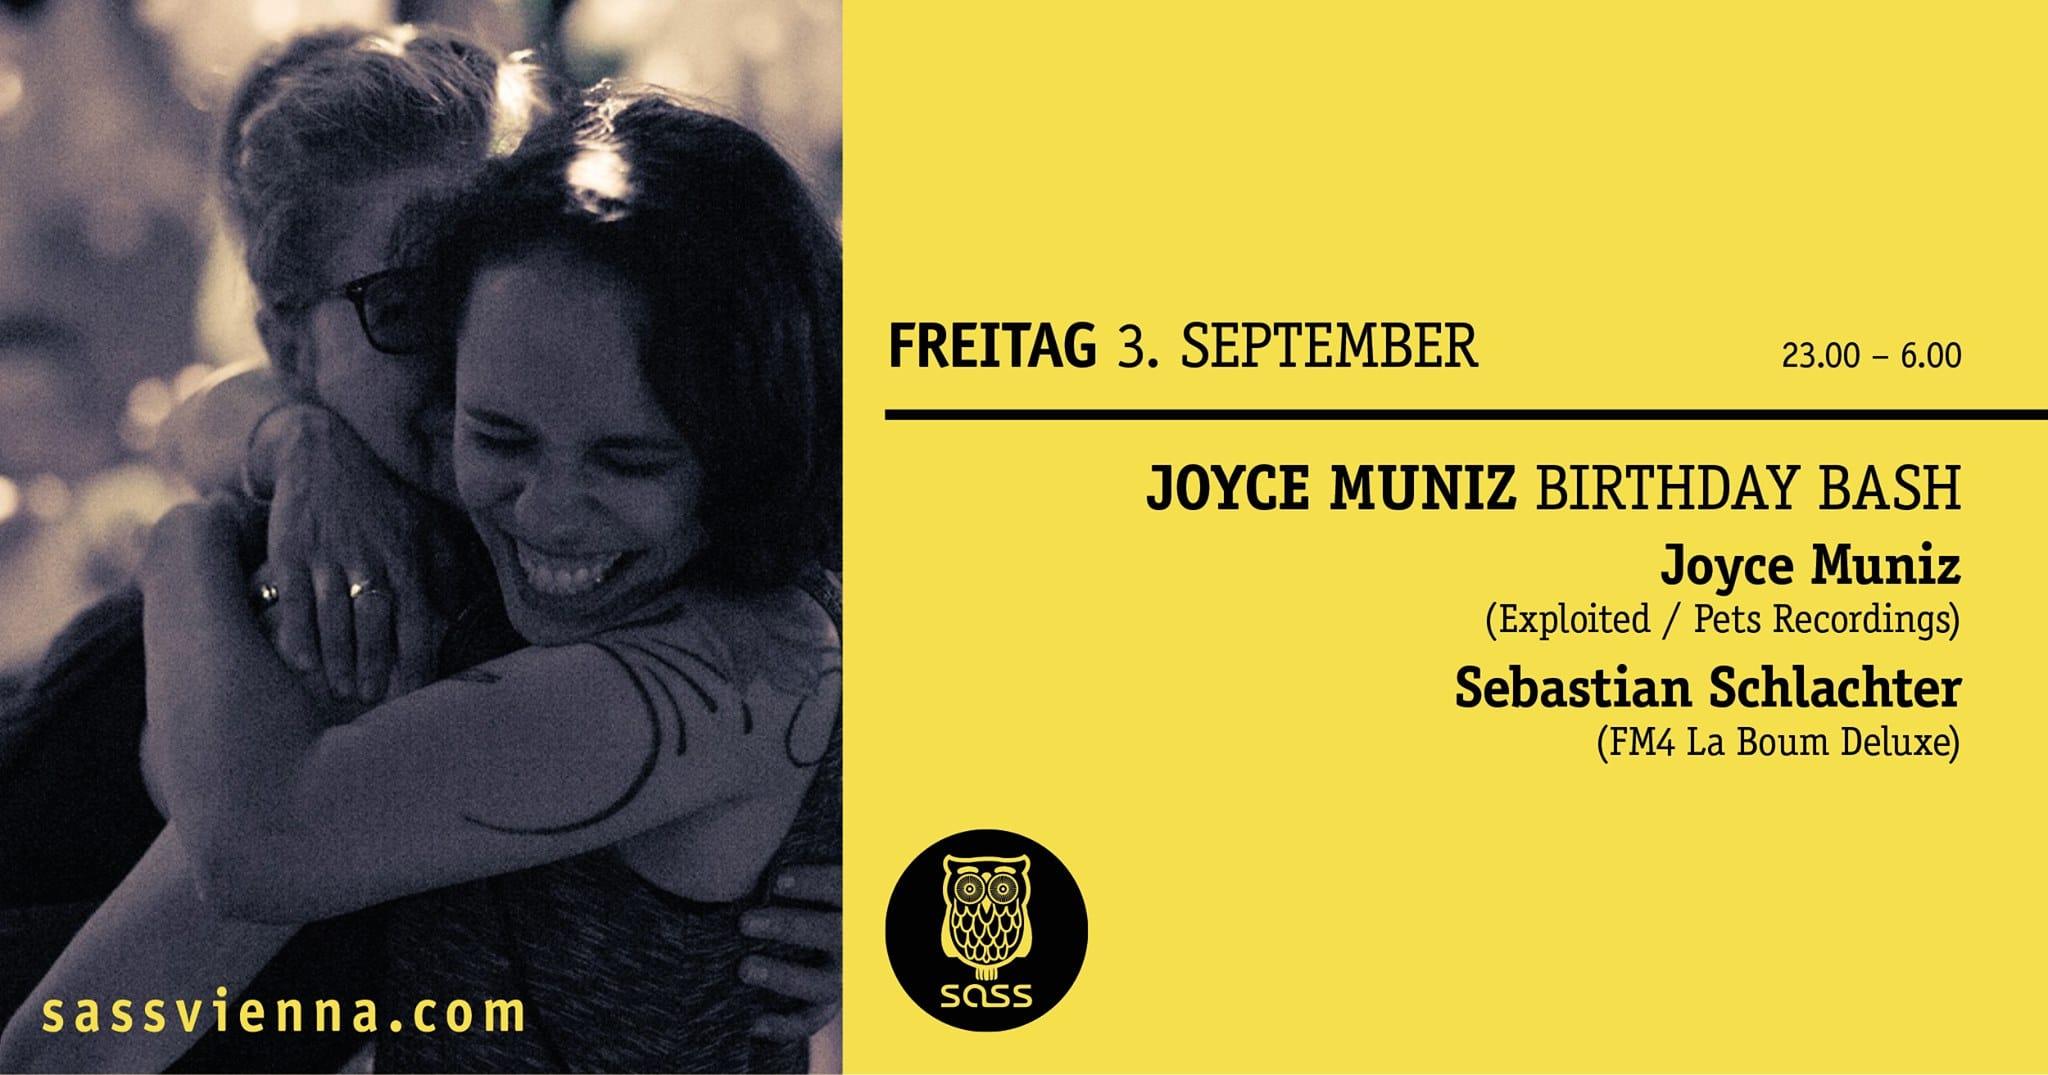 Events Wien: Joyce Muniz Birthday Bash